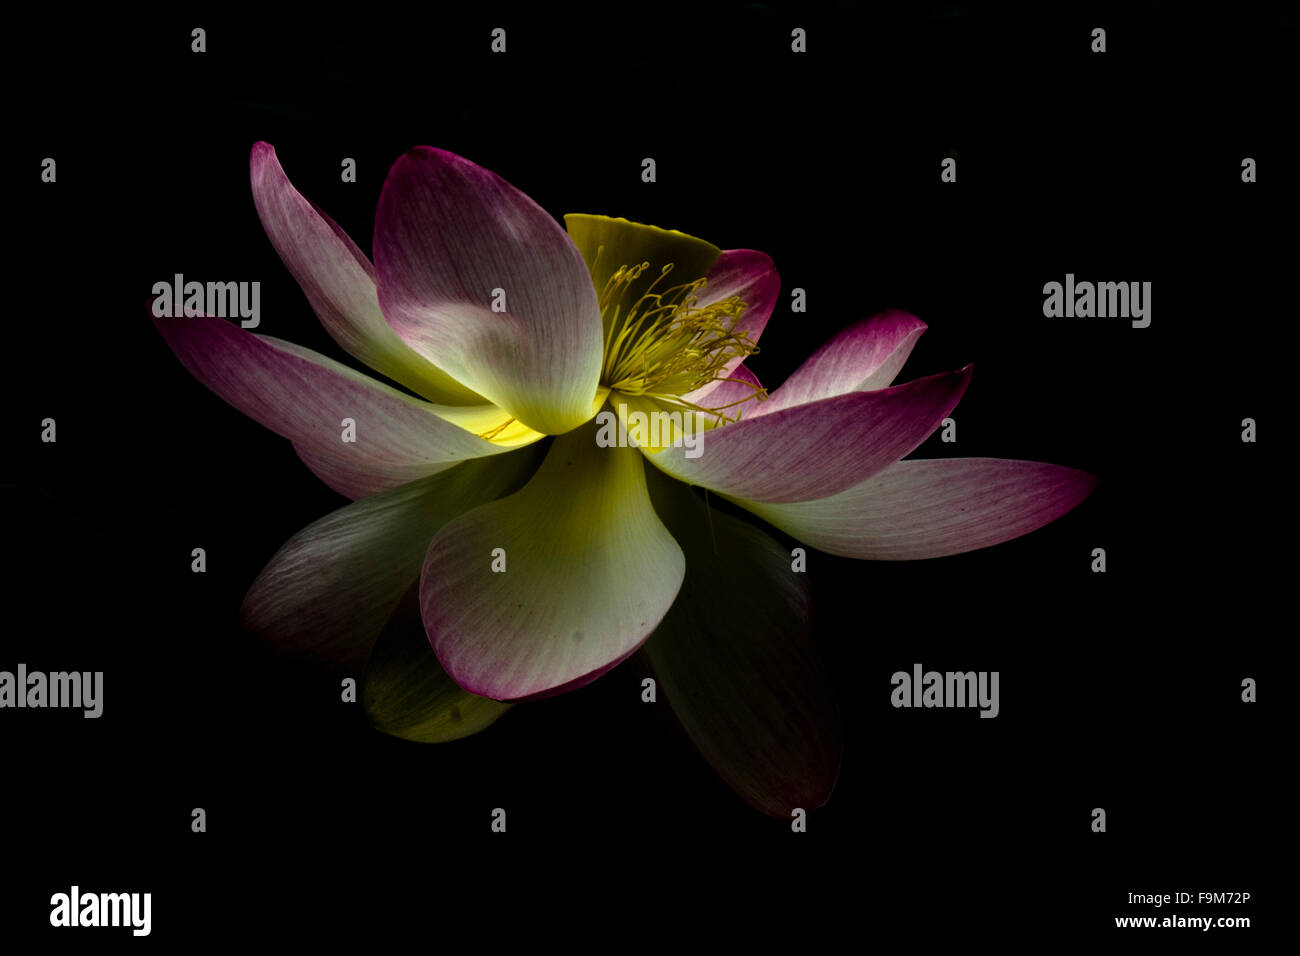 Open lotus flower on a dark background stock photo 92028350 alamy open lotus flower on a dark background izmirmasajfo